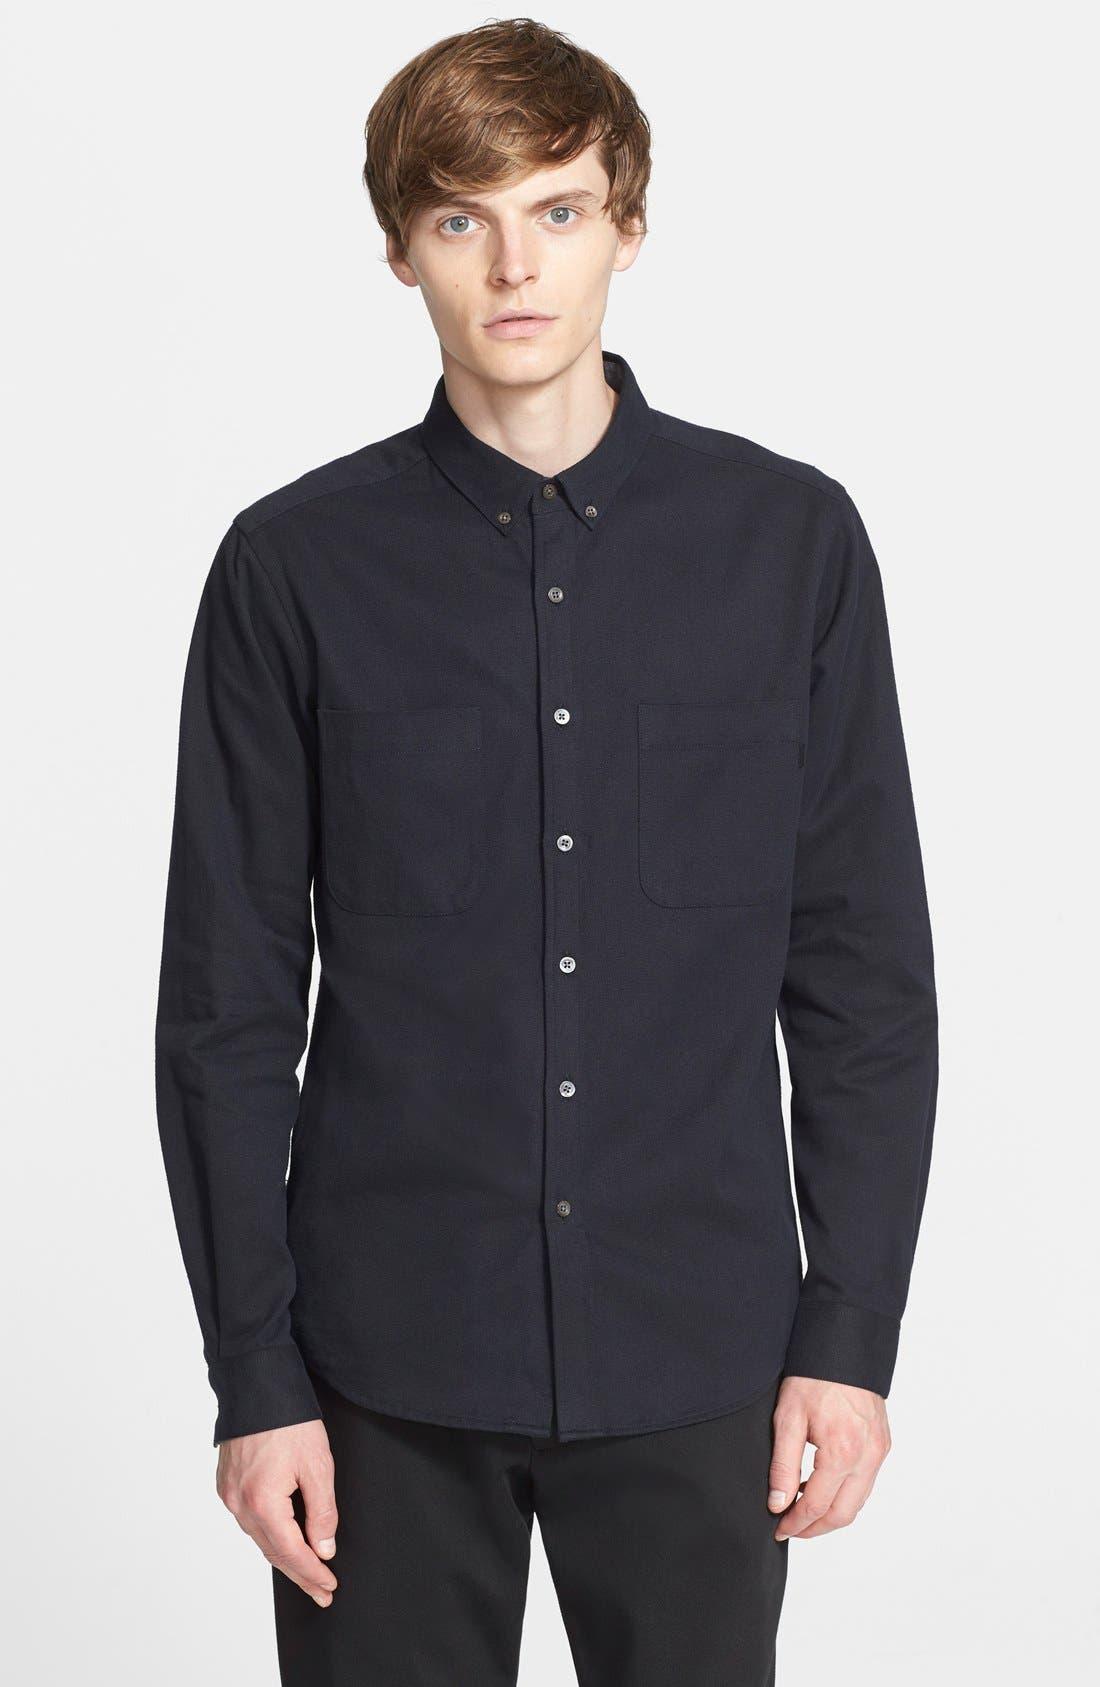 PATRIK ERVELL Heavyweight Cotton Oxford Shirt, Main, color, 001